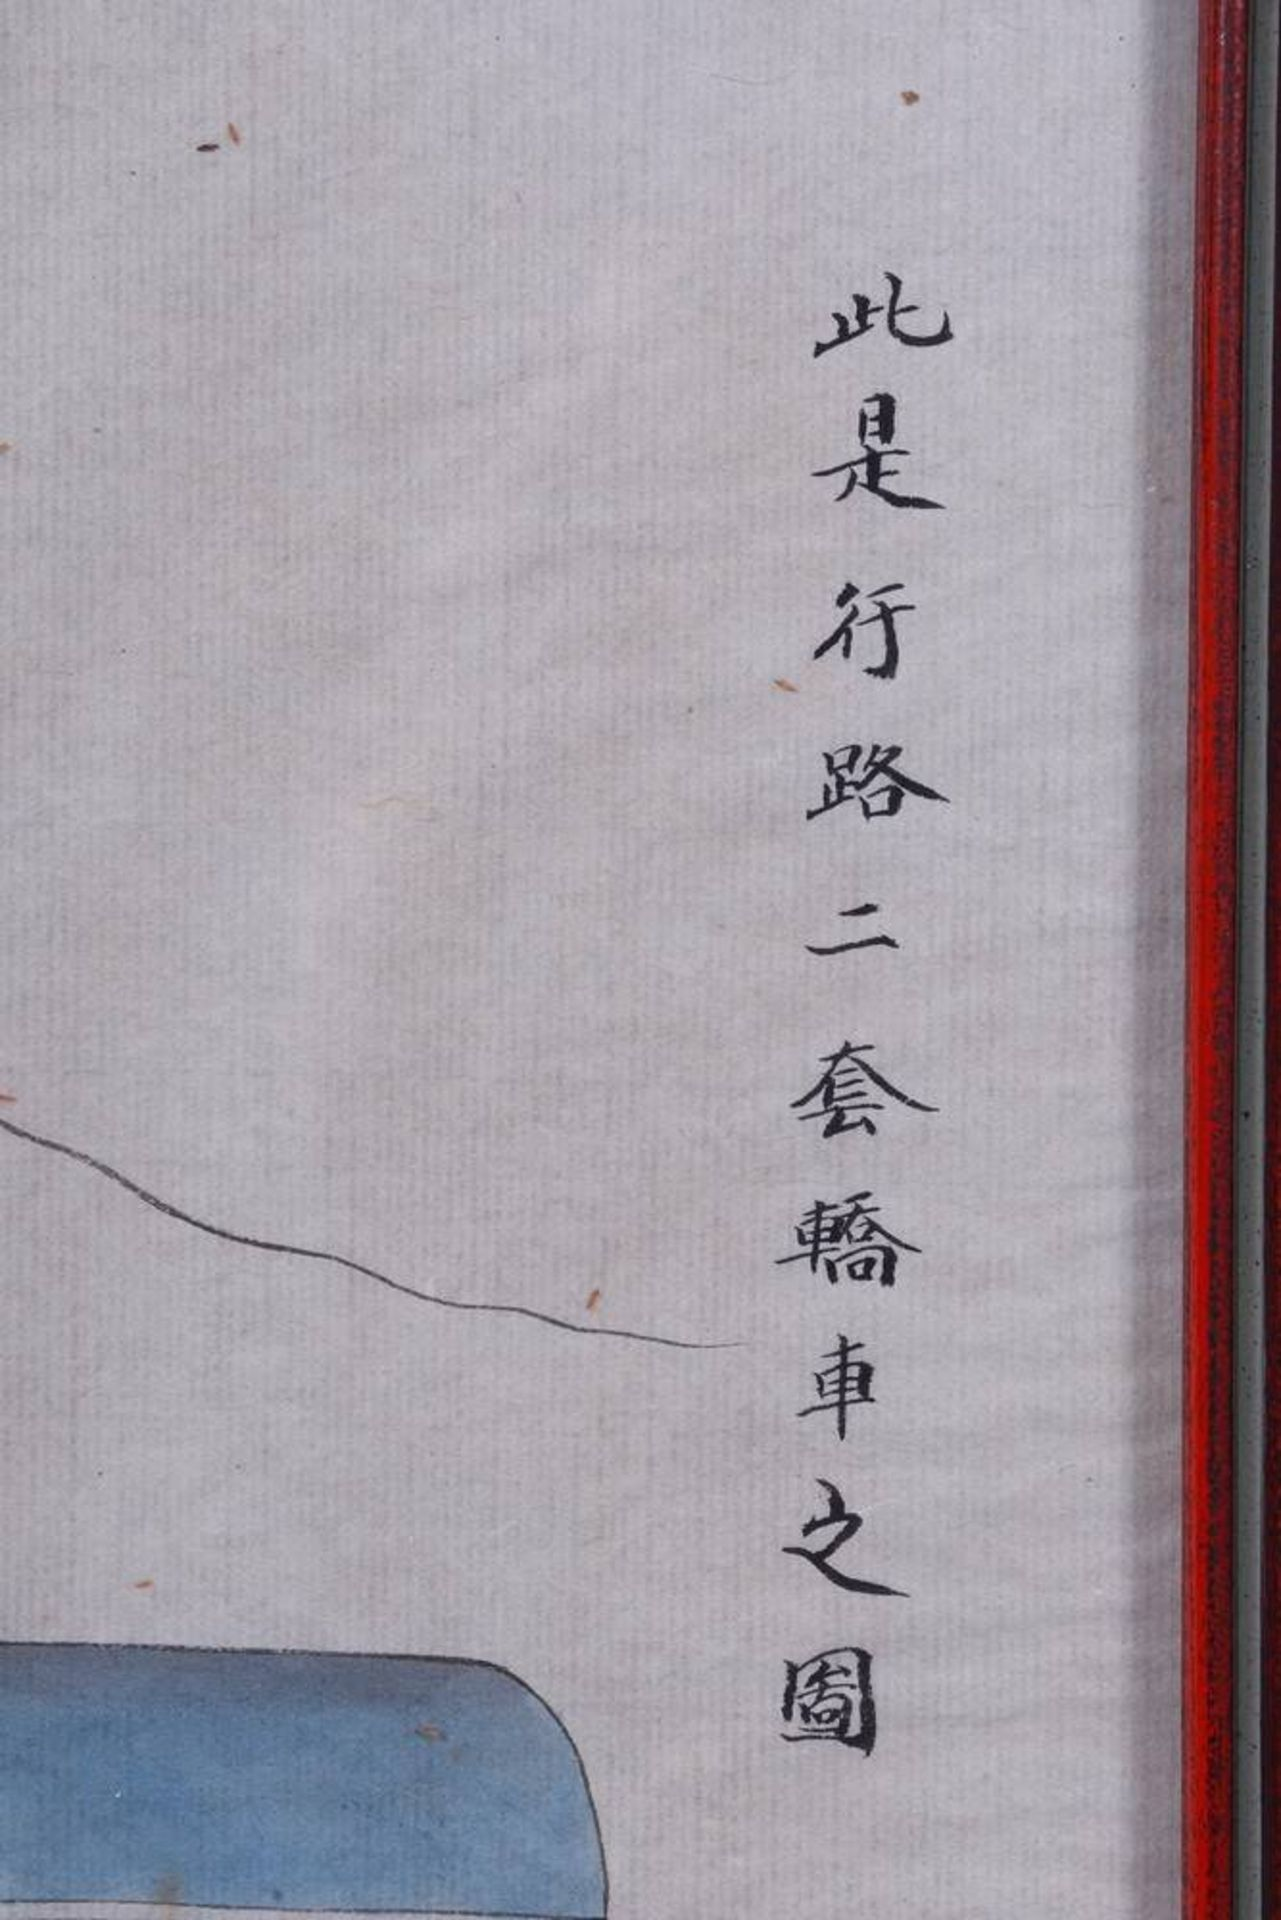 Zhou Peichun (China, tätig Ende 19.Jh./Anfang 20.Jh.) - Image 2 of 5